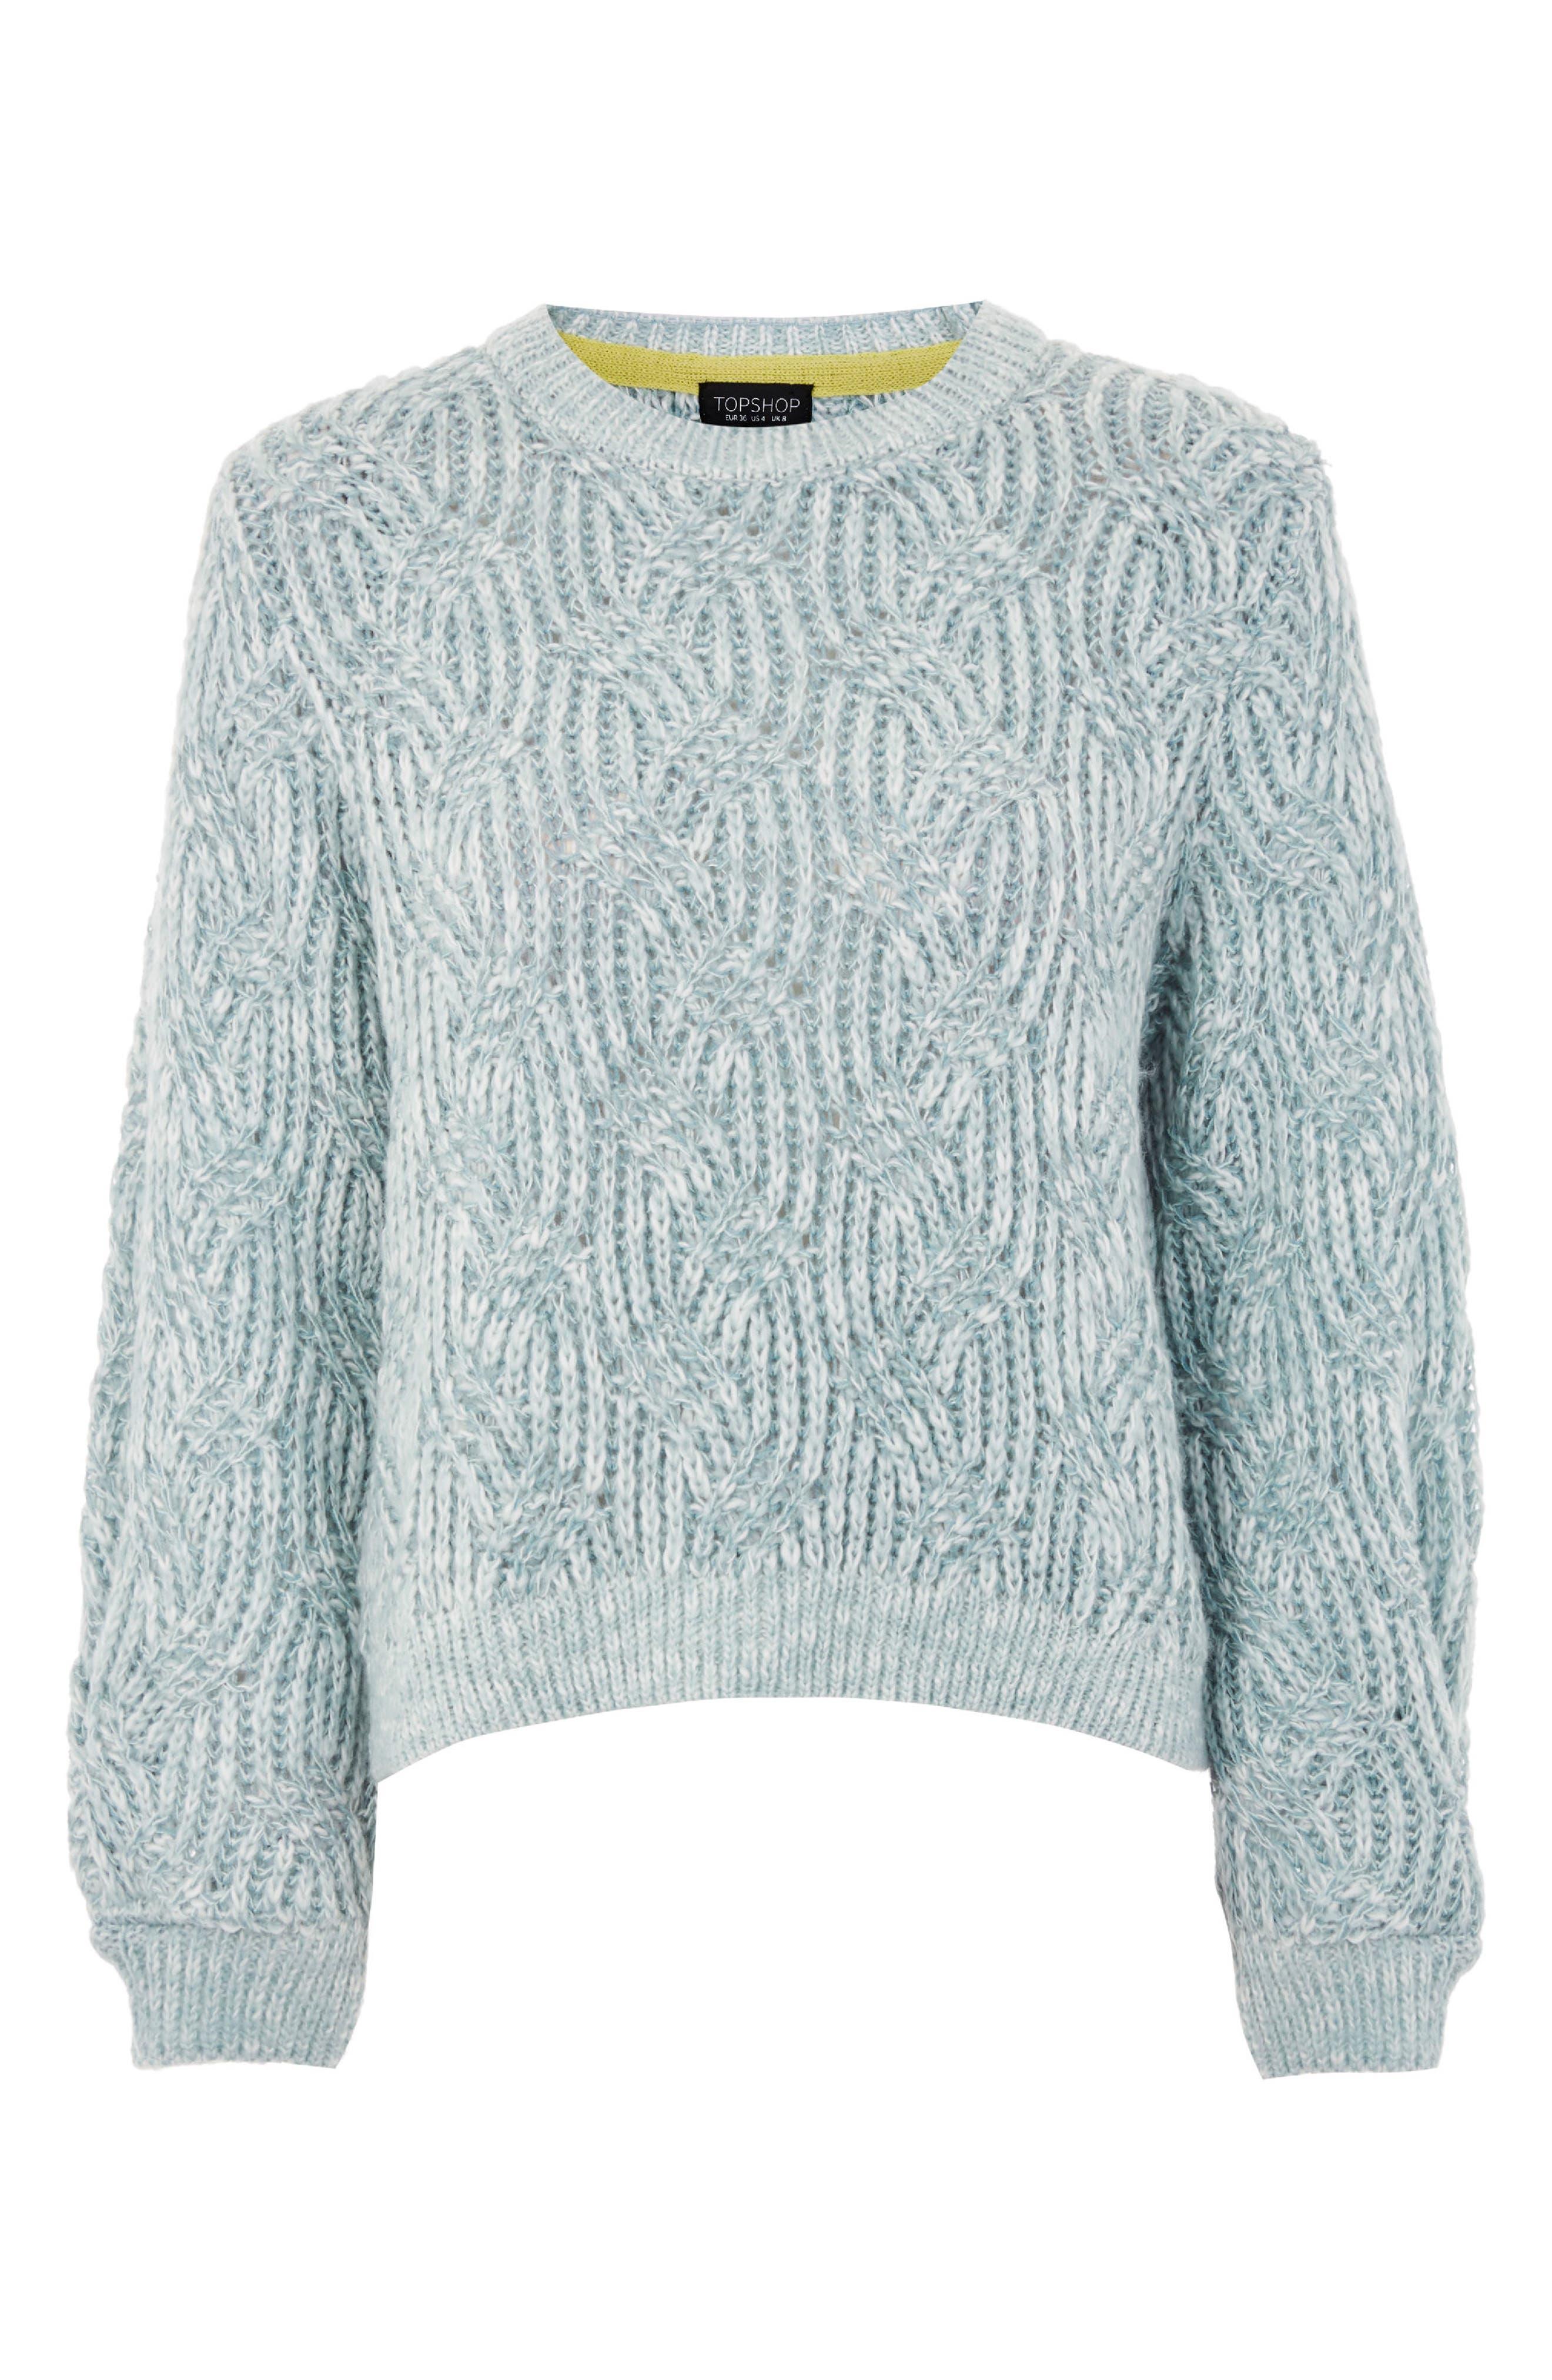 Swirl Tuck Sweater,                             Alternate thumbnail 3, color,                             450